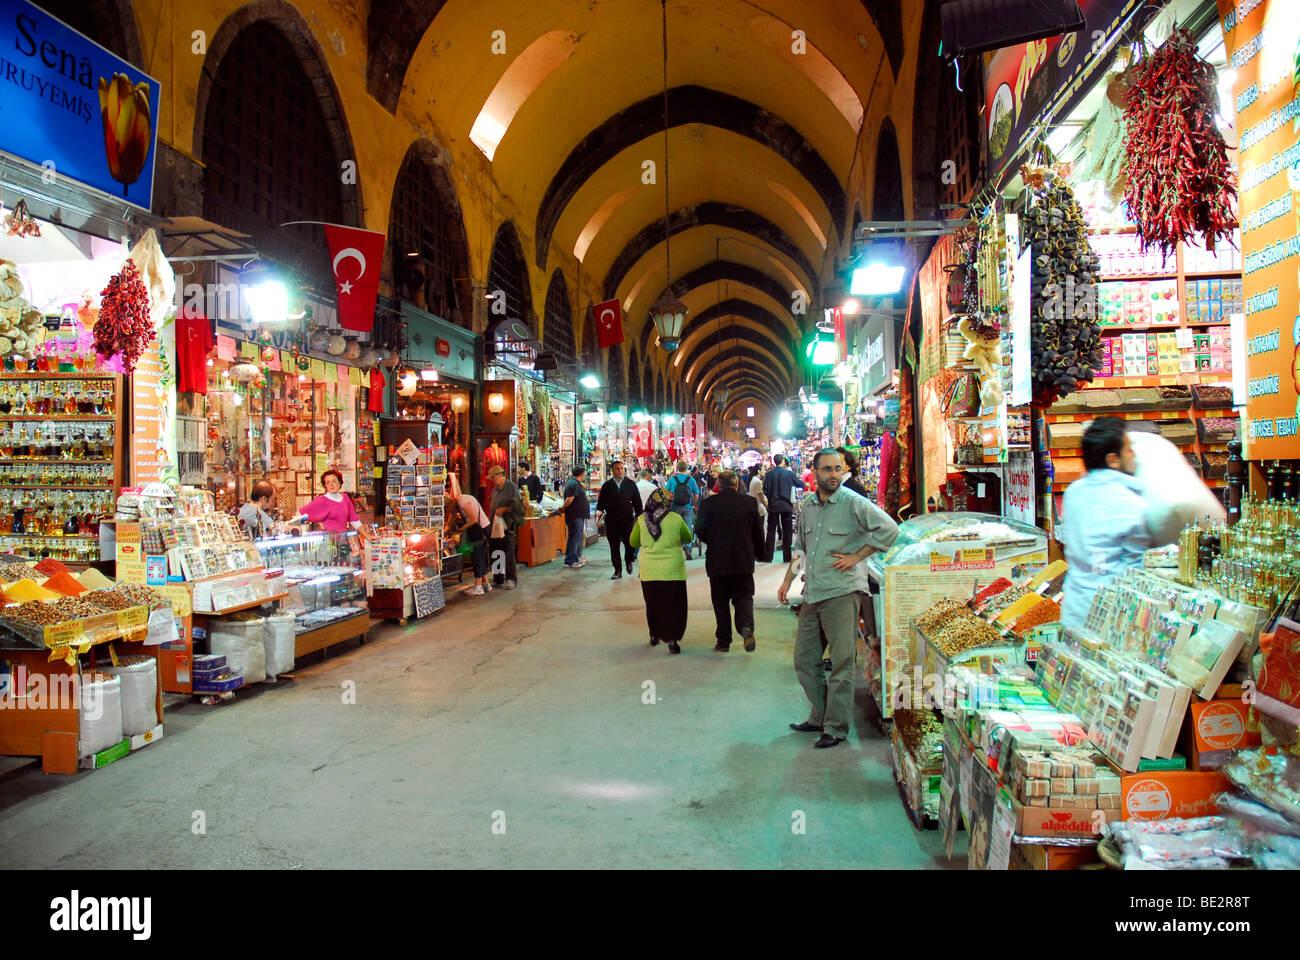 Egyptian Bazaar, Misir Carsisi, spice bazaar in Sirkeci, Sirkeci district, Istanbul, Turkey - Stock Image